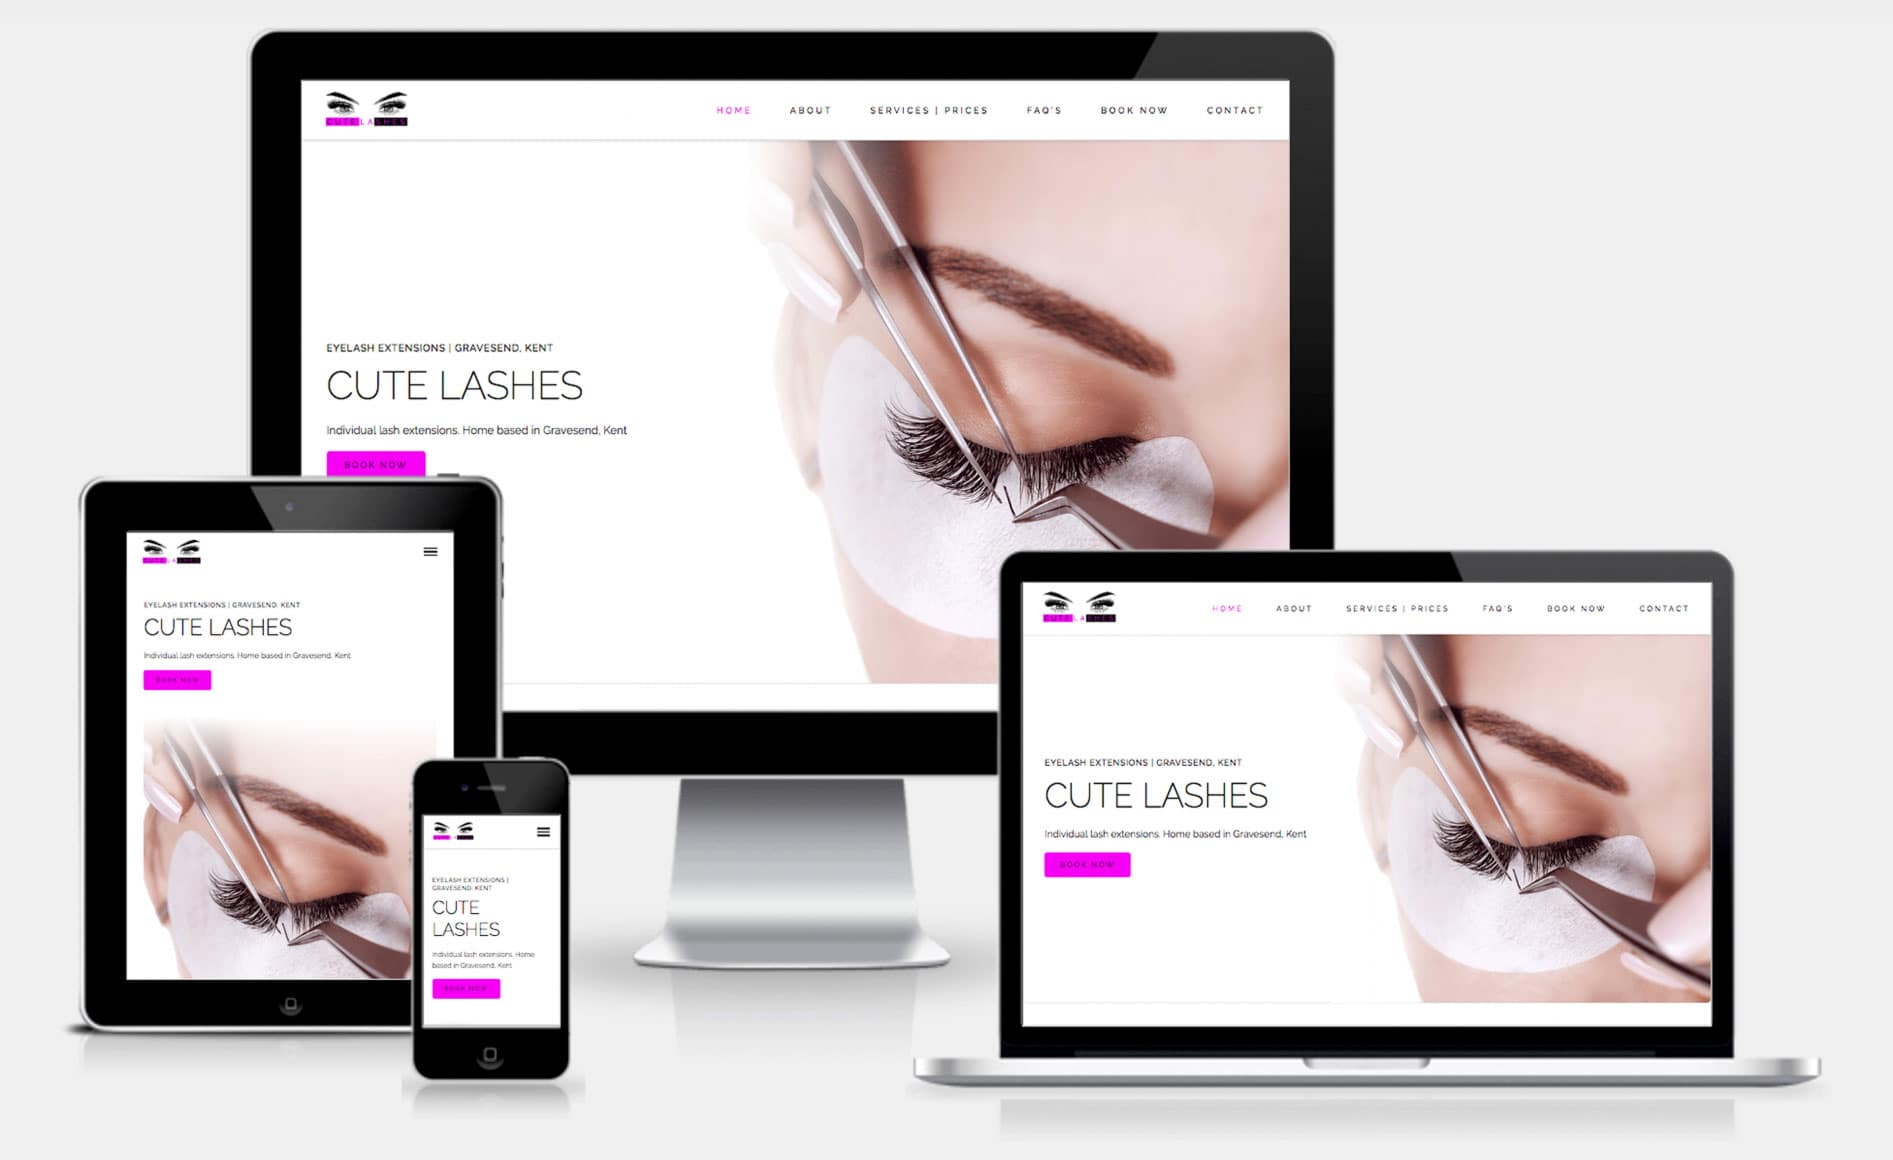 M-Power-beauty-webdesign-Cute-Lashes-website